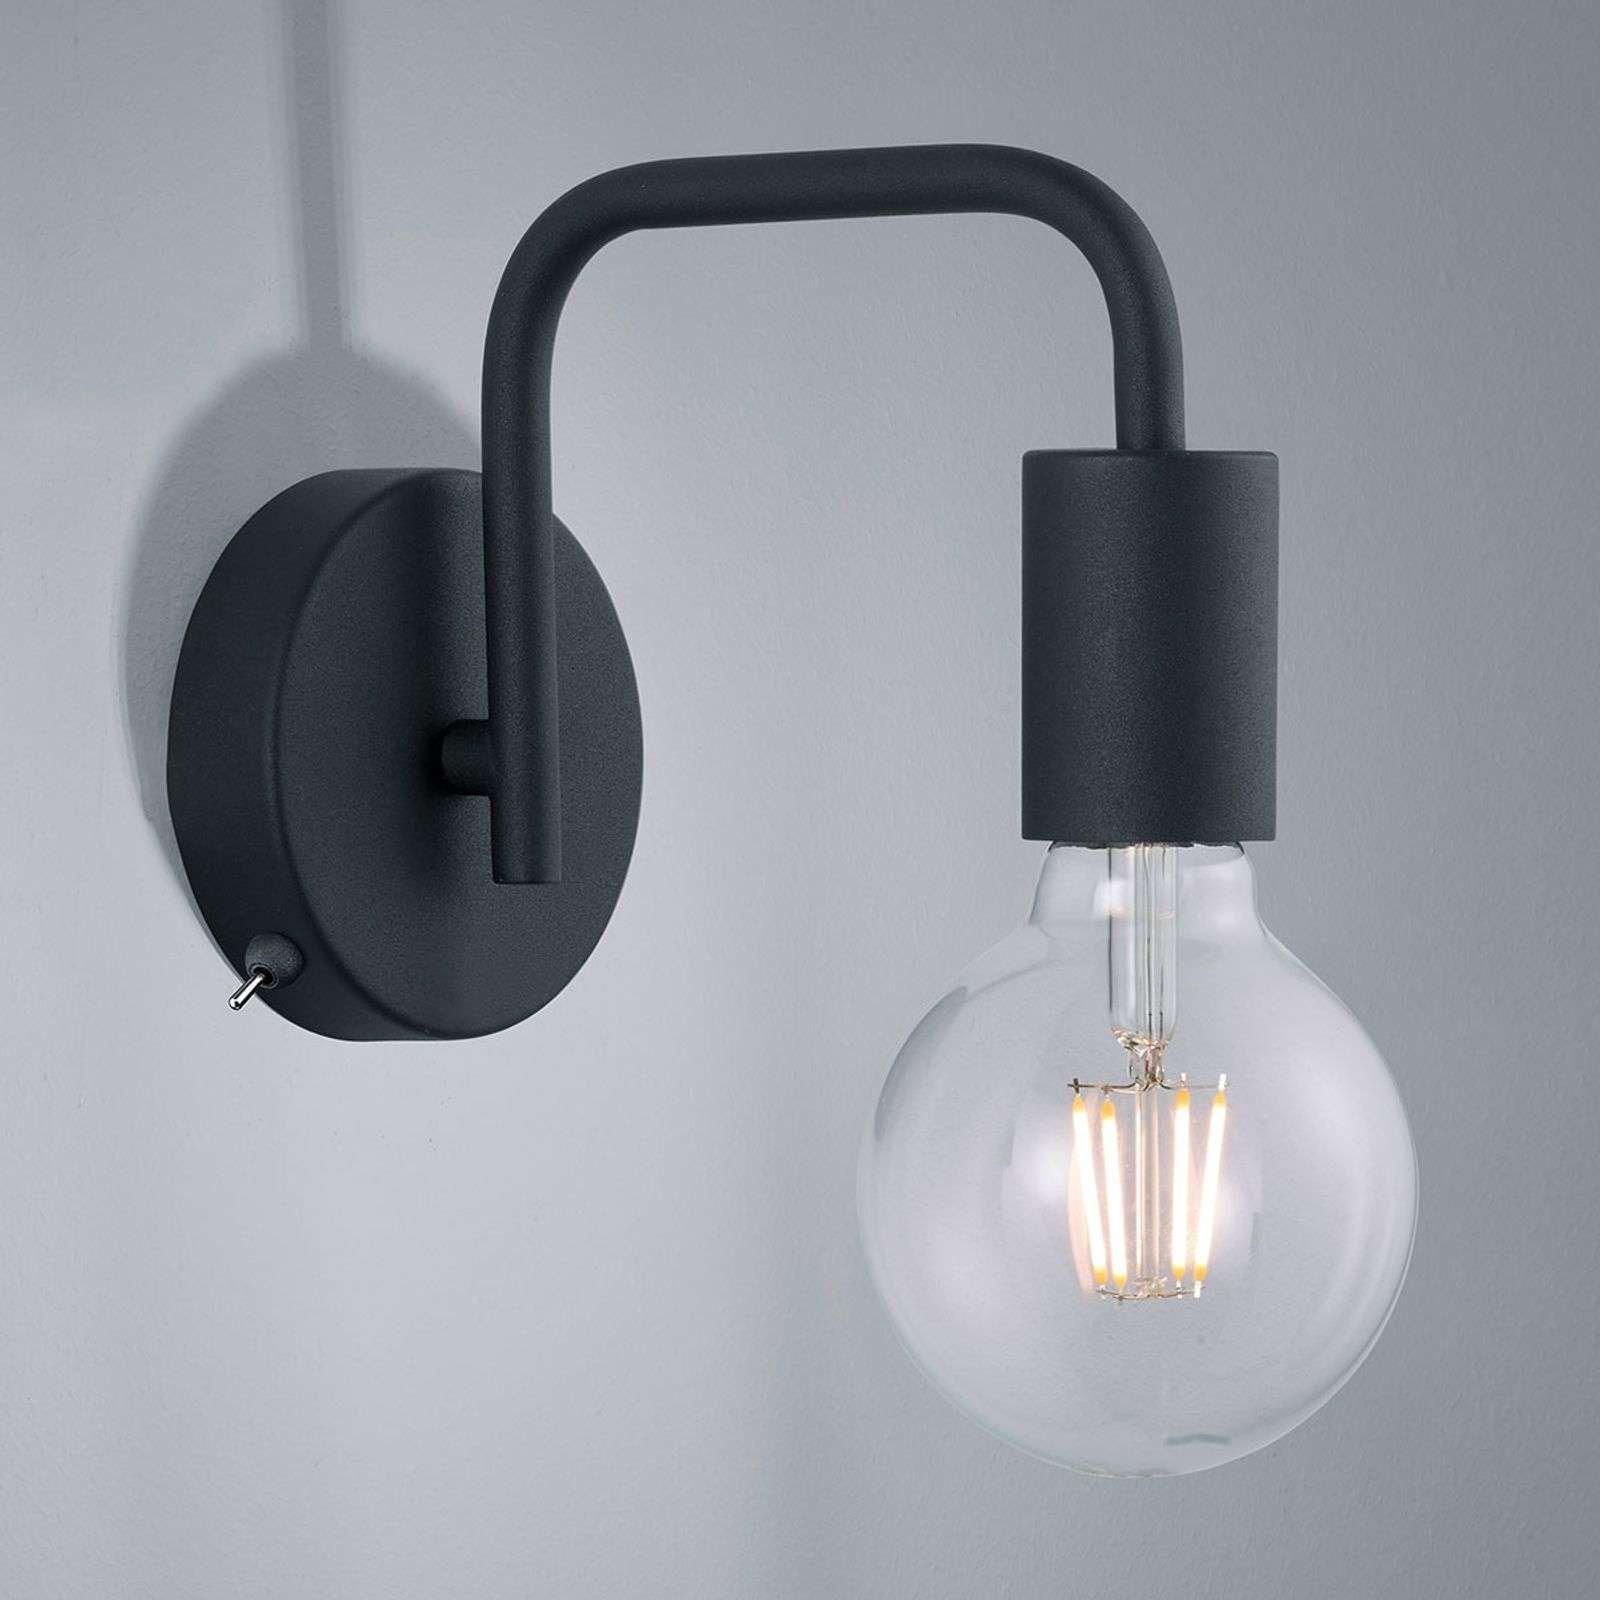 Diallo wall light without lampshade  matt black